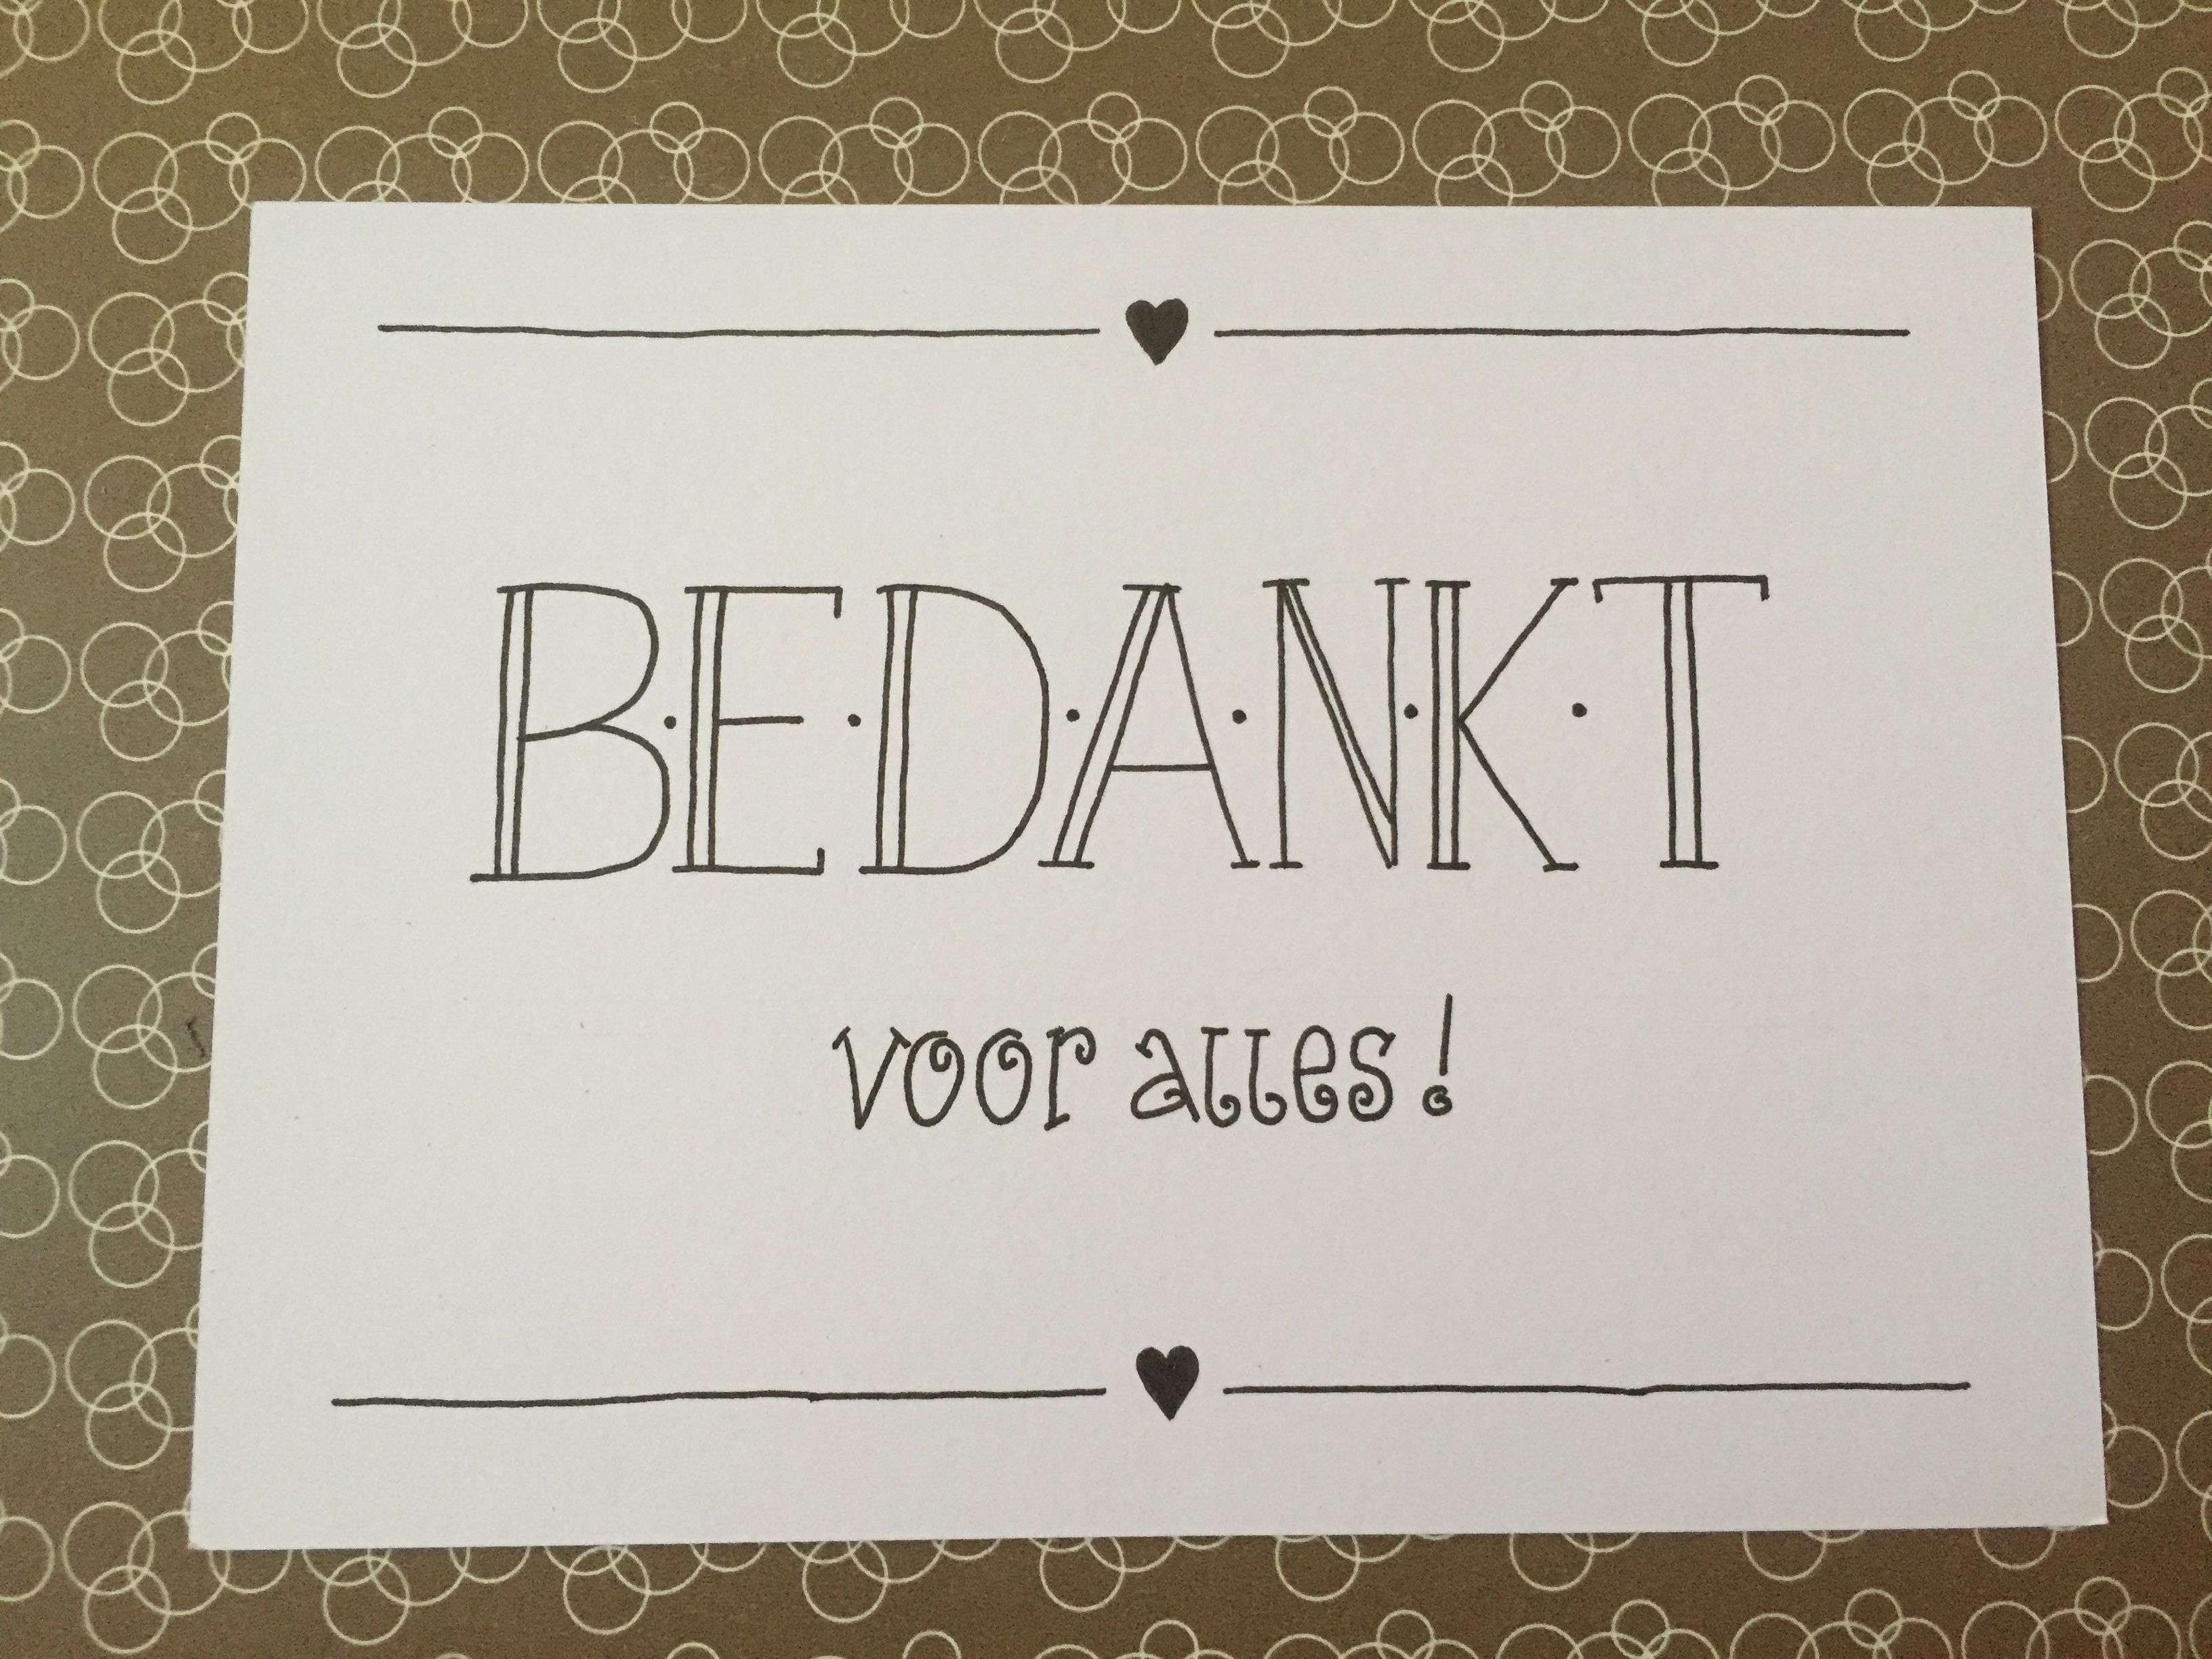 Bekend Handlettering kaart met bedankt voor alles! | Lettering  @RG69